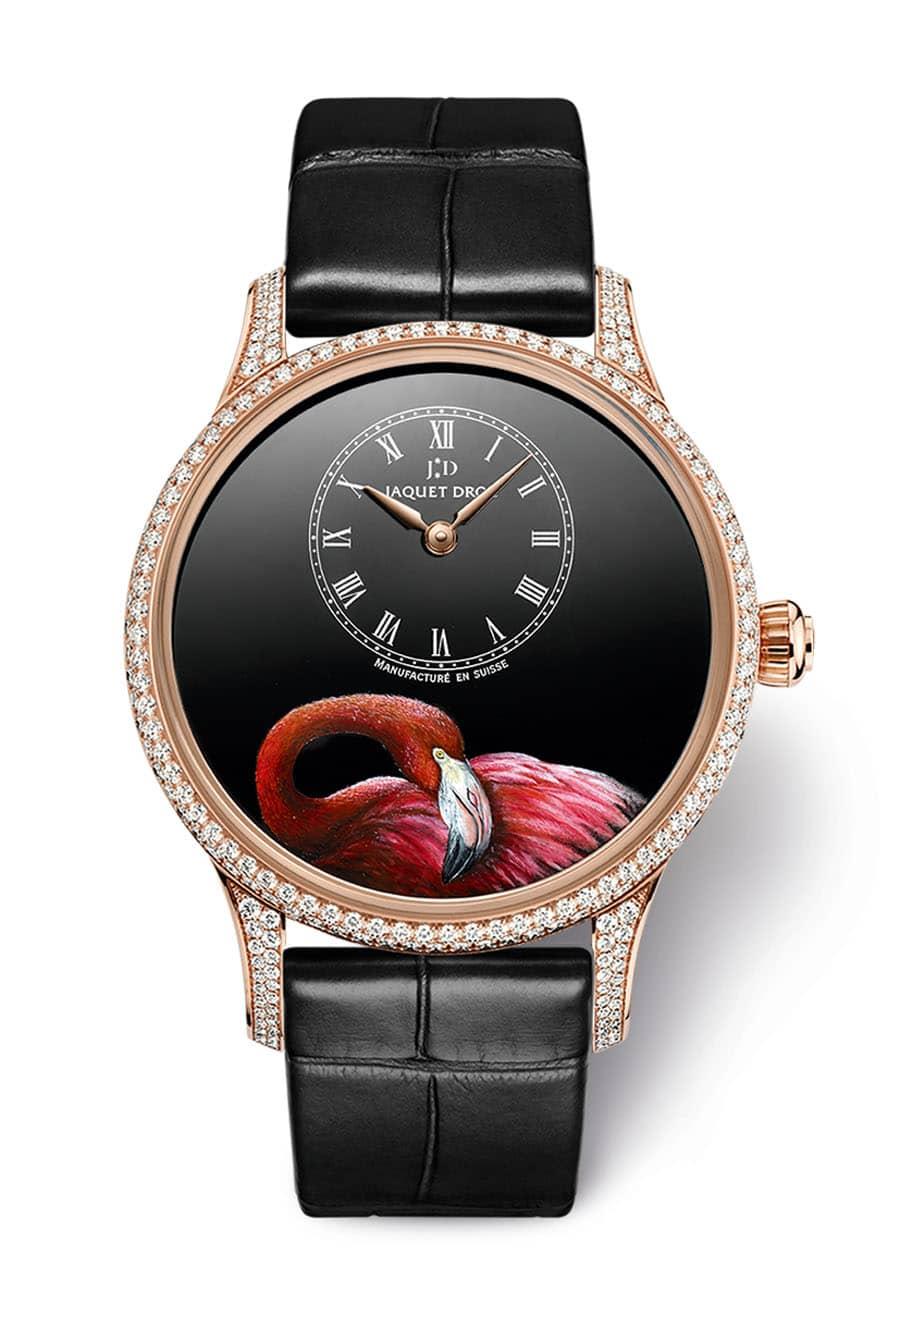 Jaquet Droz: Petite Heure Minute Pink Flamingo